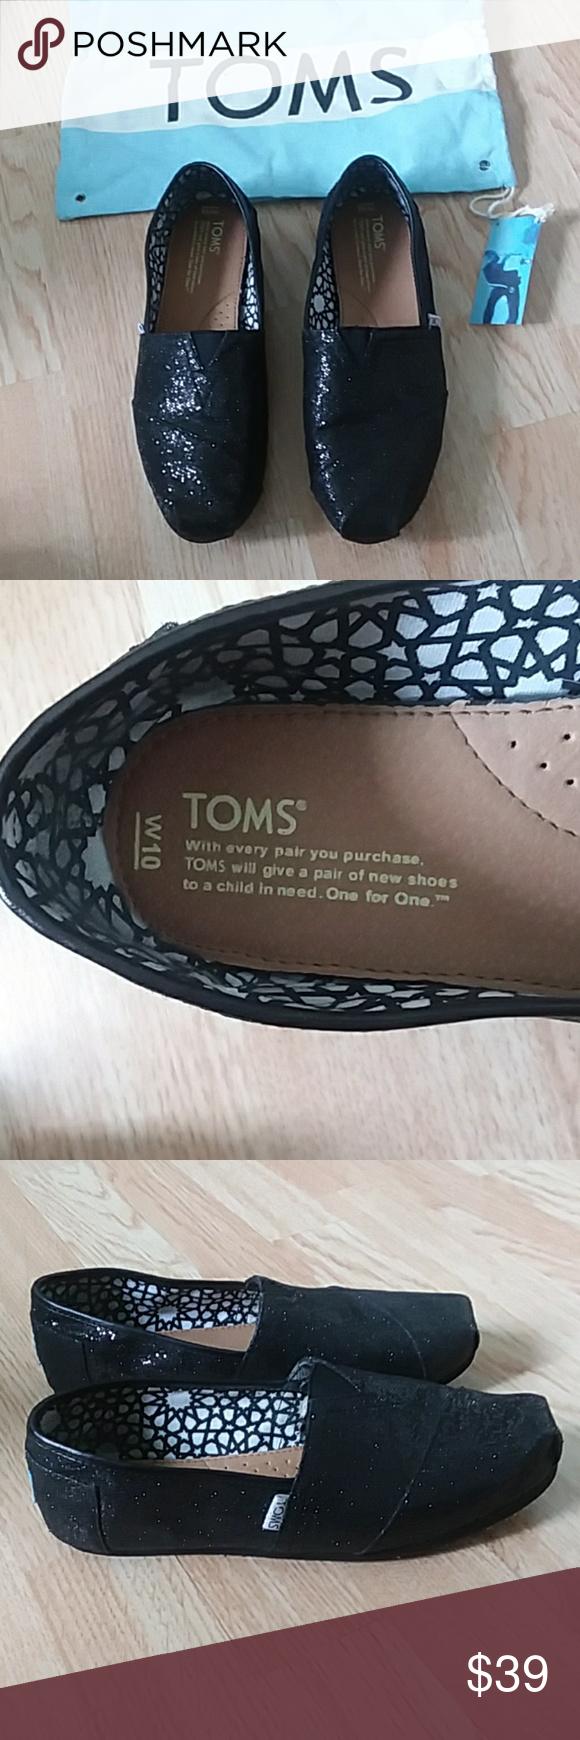 NIB Tom's sparkly slip ons   Toms, Slip